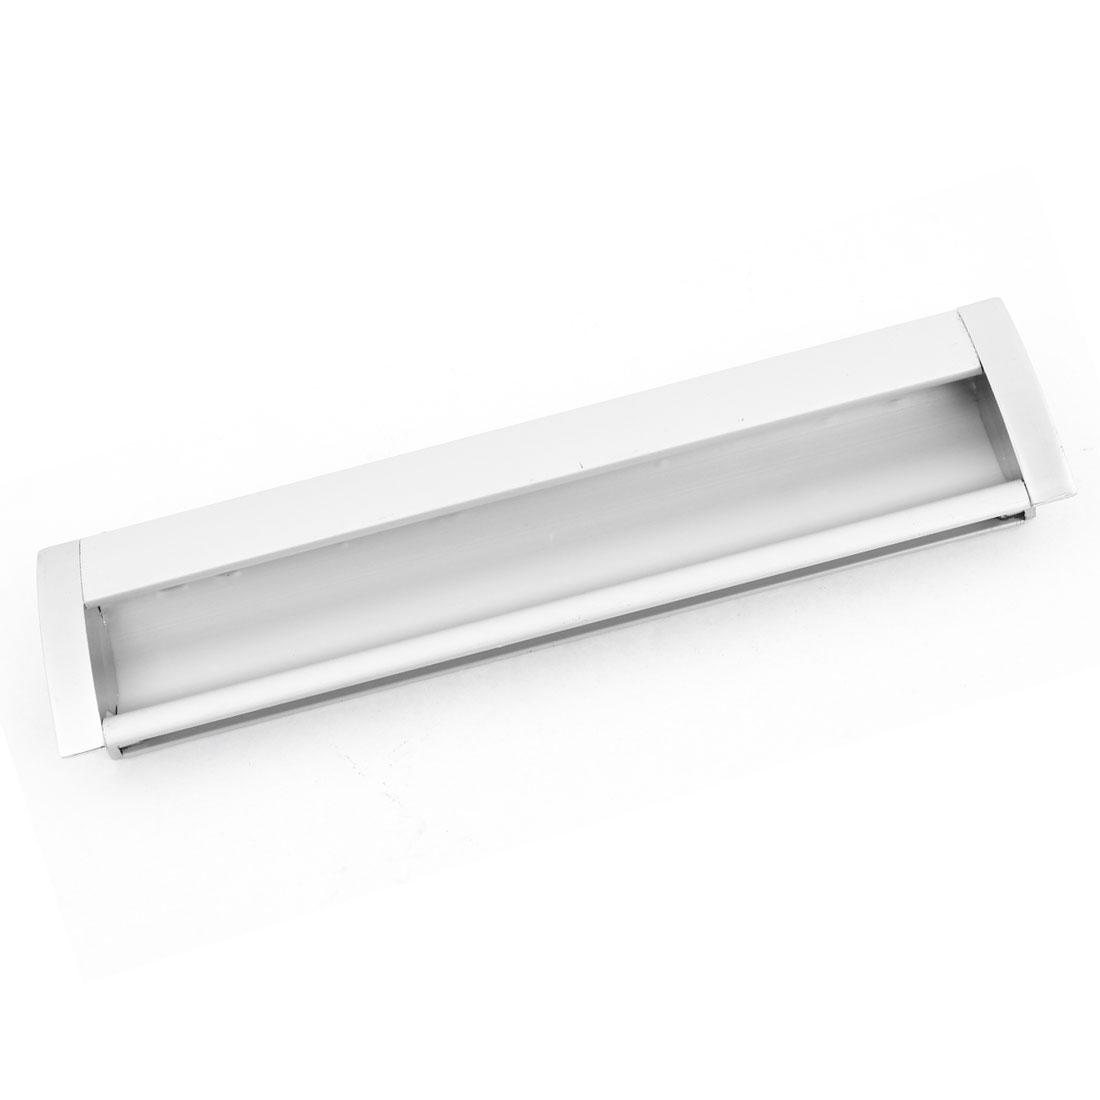 Cabinet Hardware Parts Silver Tone Aluminum Flush Pull Handle 170mm Length